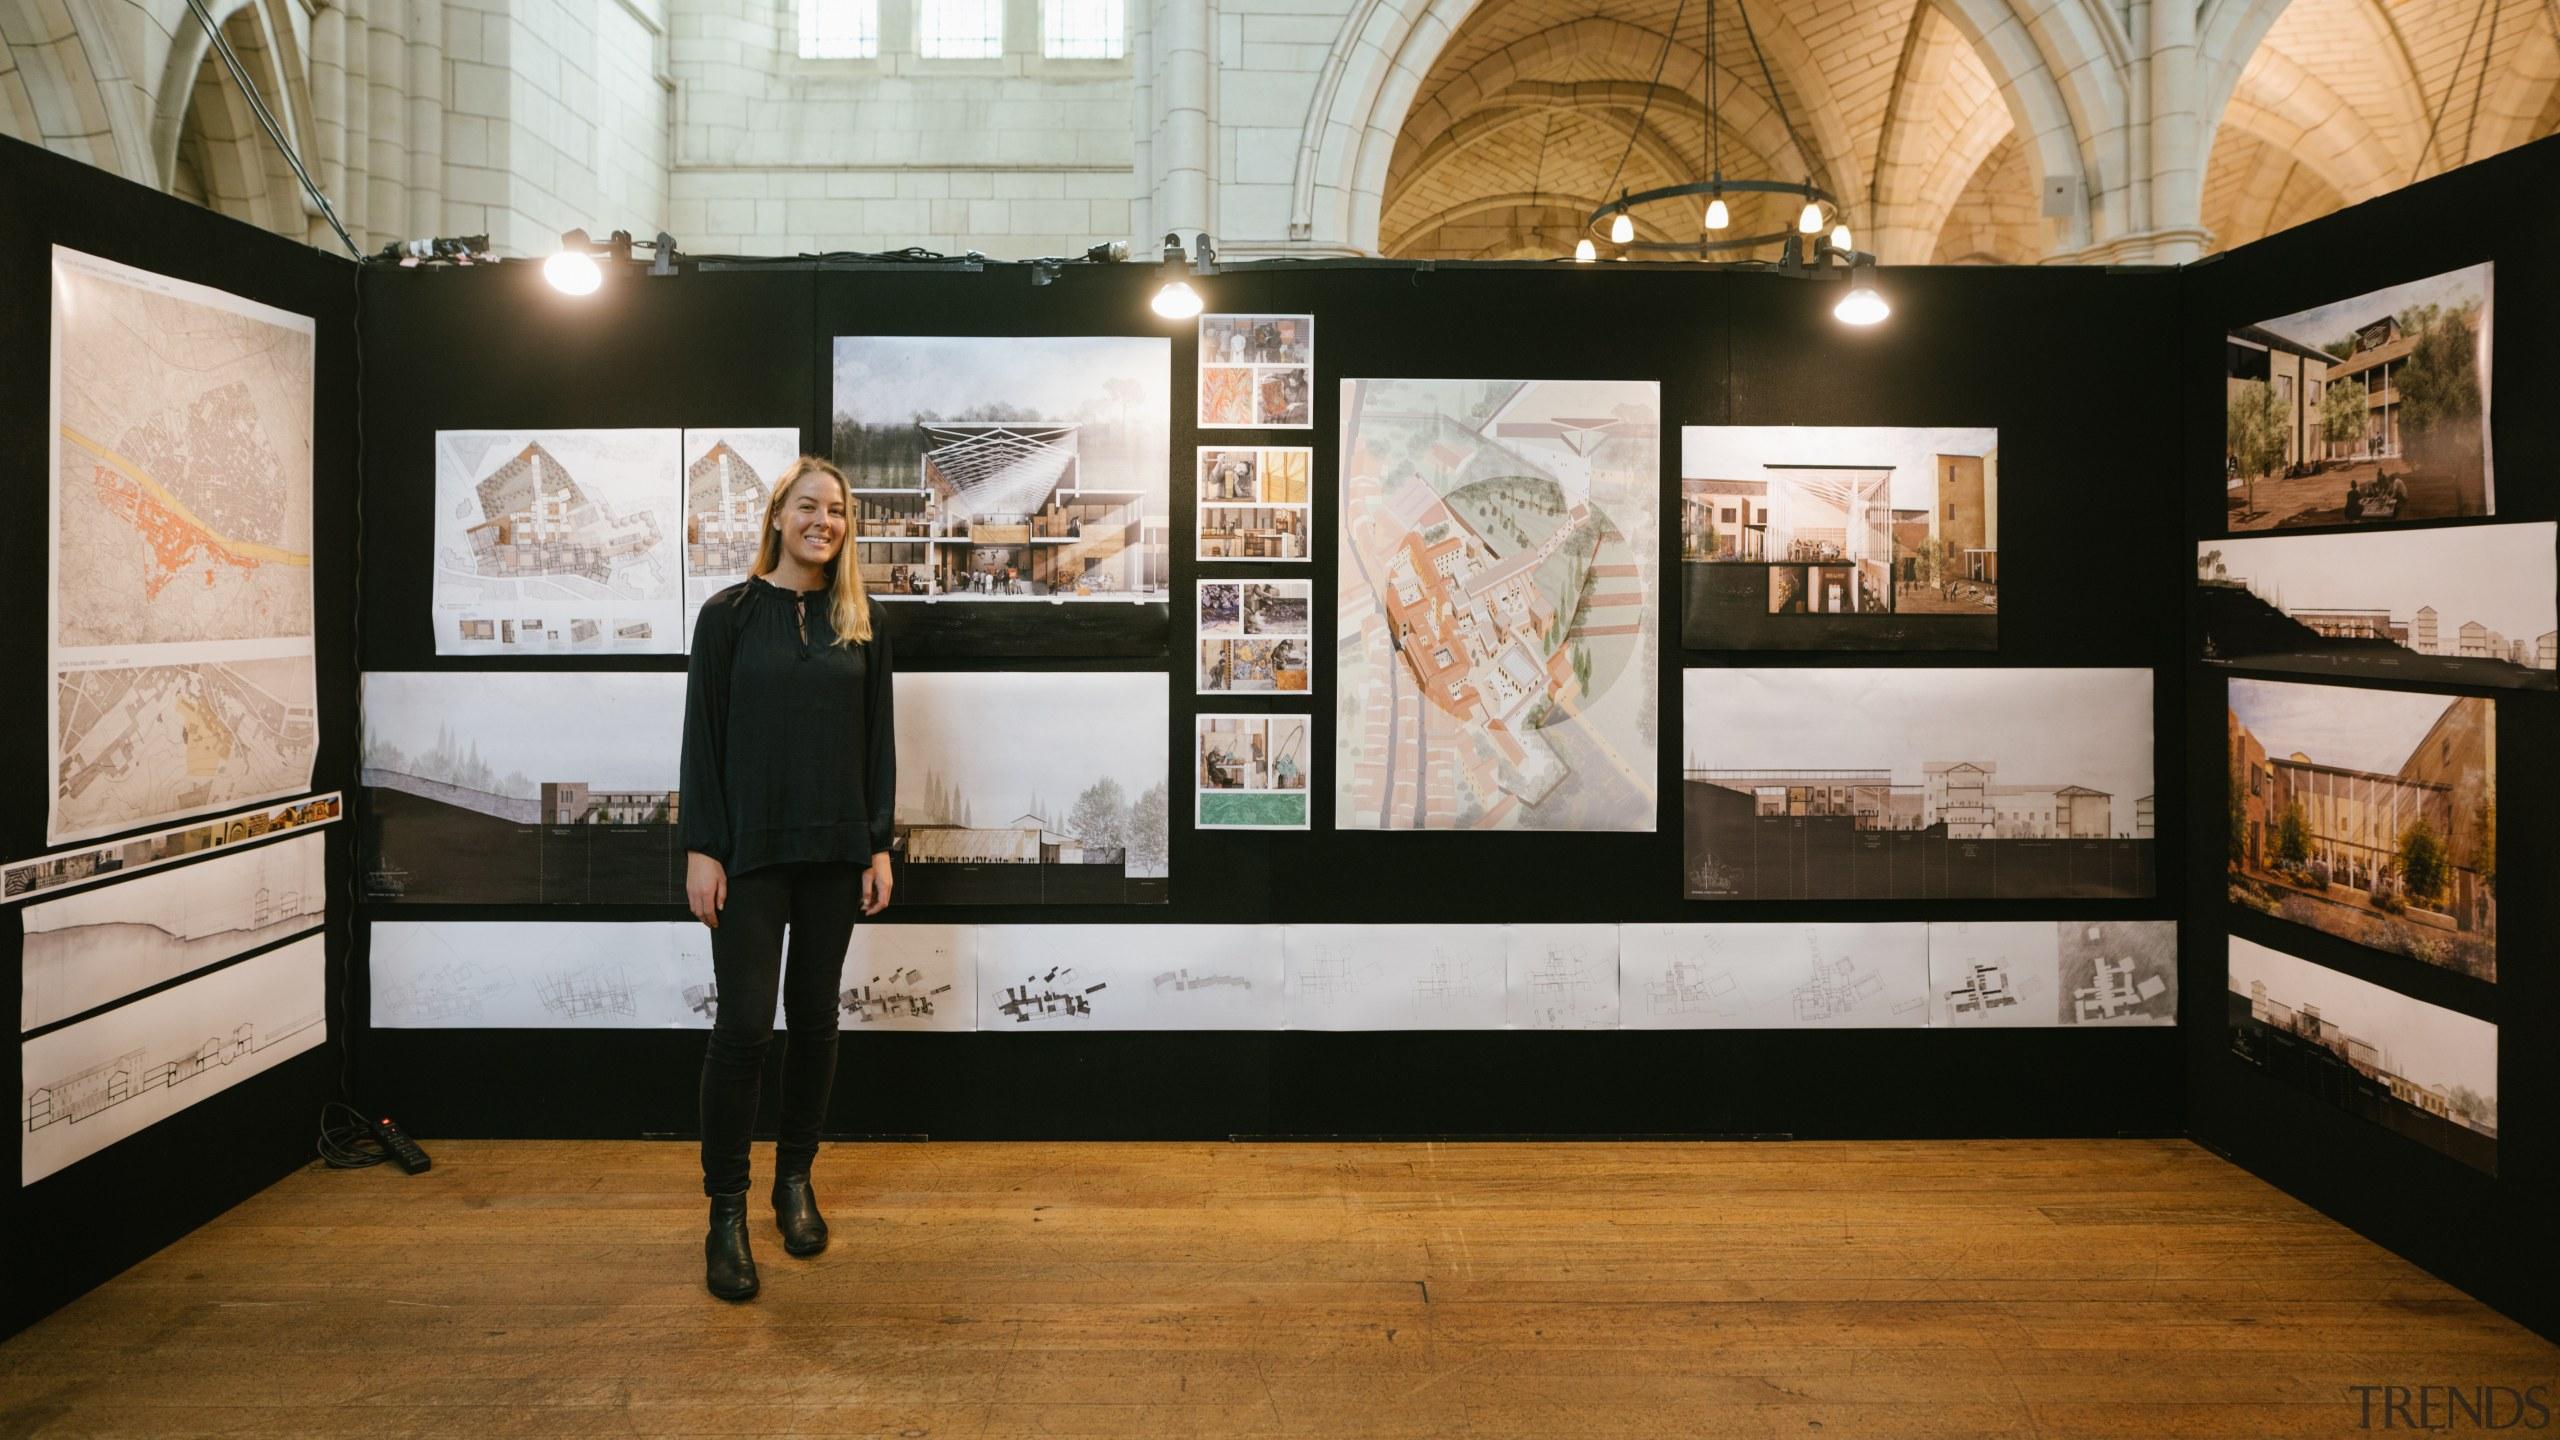 Emily Pearce – Victoria University Of Wellington – art exhibition, art gallery, collection, exhibition, museum, tourist attraction, black, gray